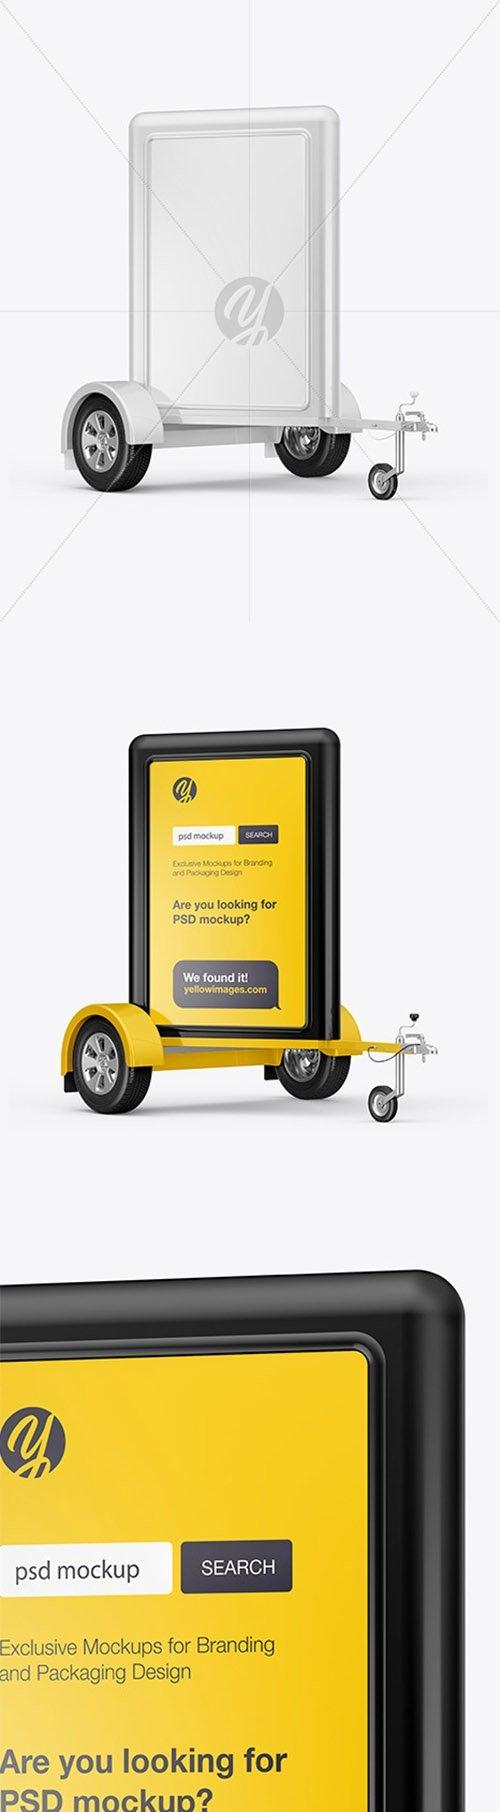 Mobile Adverstising Board Mockups 68317